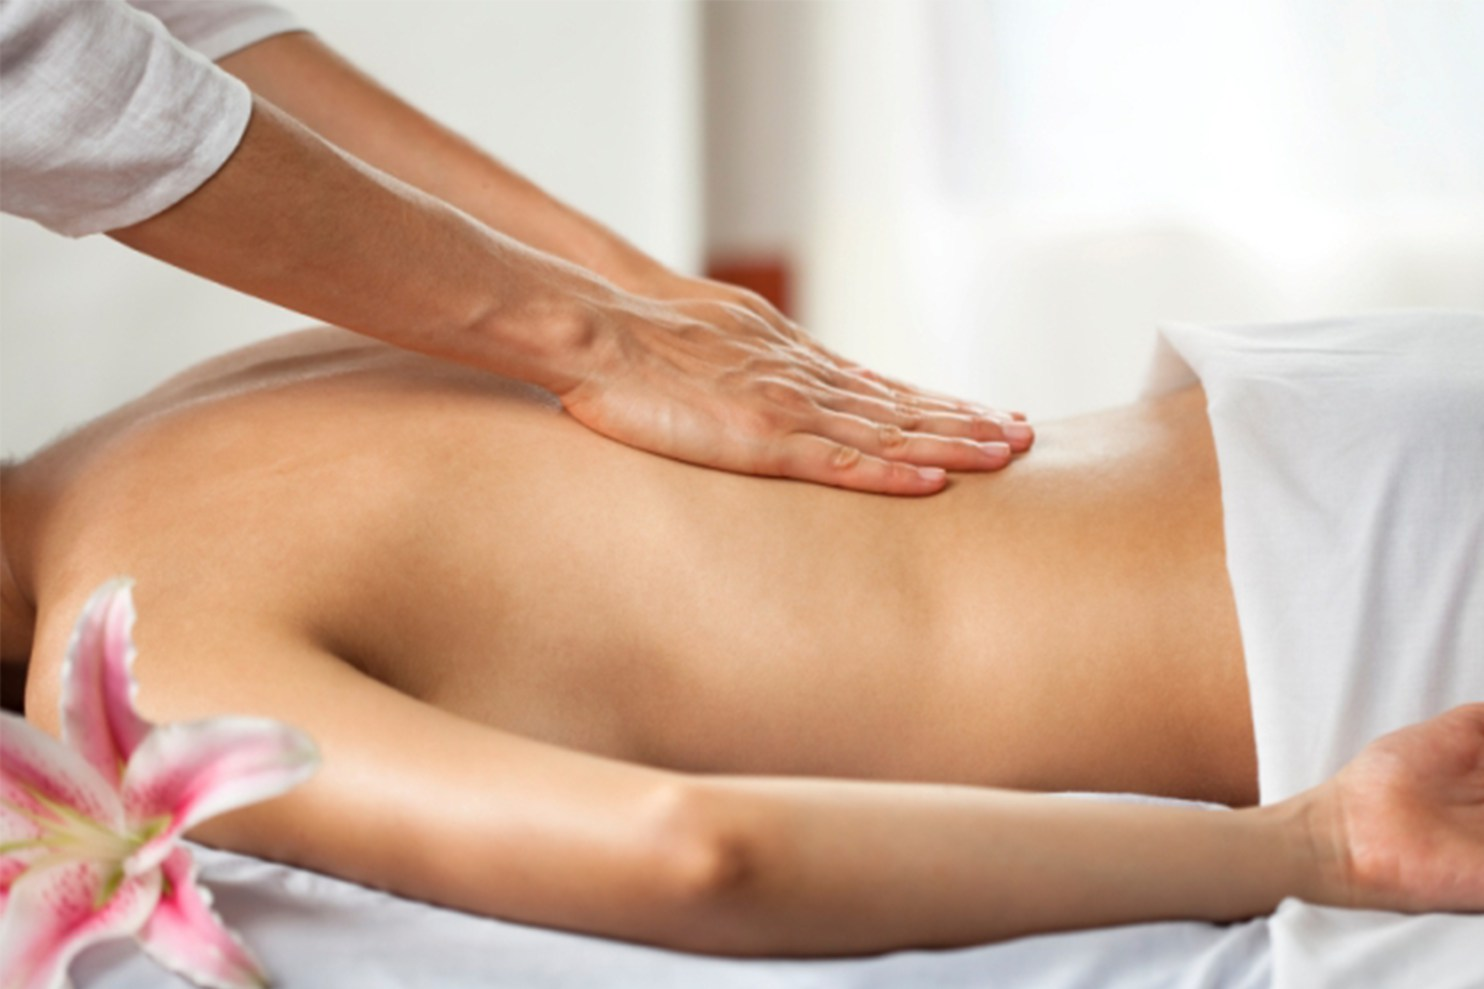 Massage Therapy Program | NJ | Ace HealthCare Training